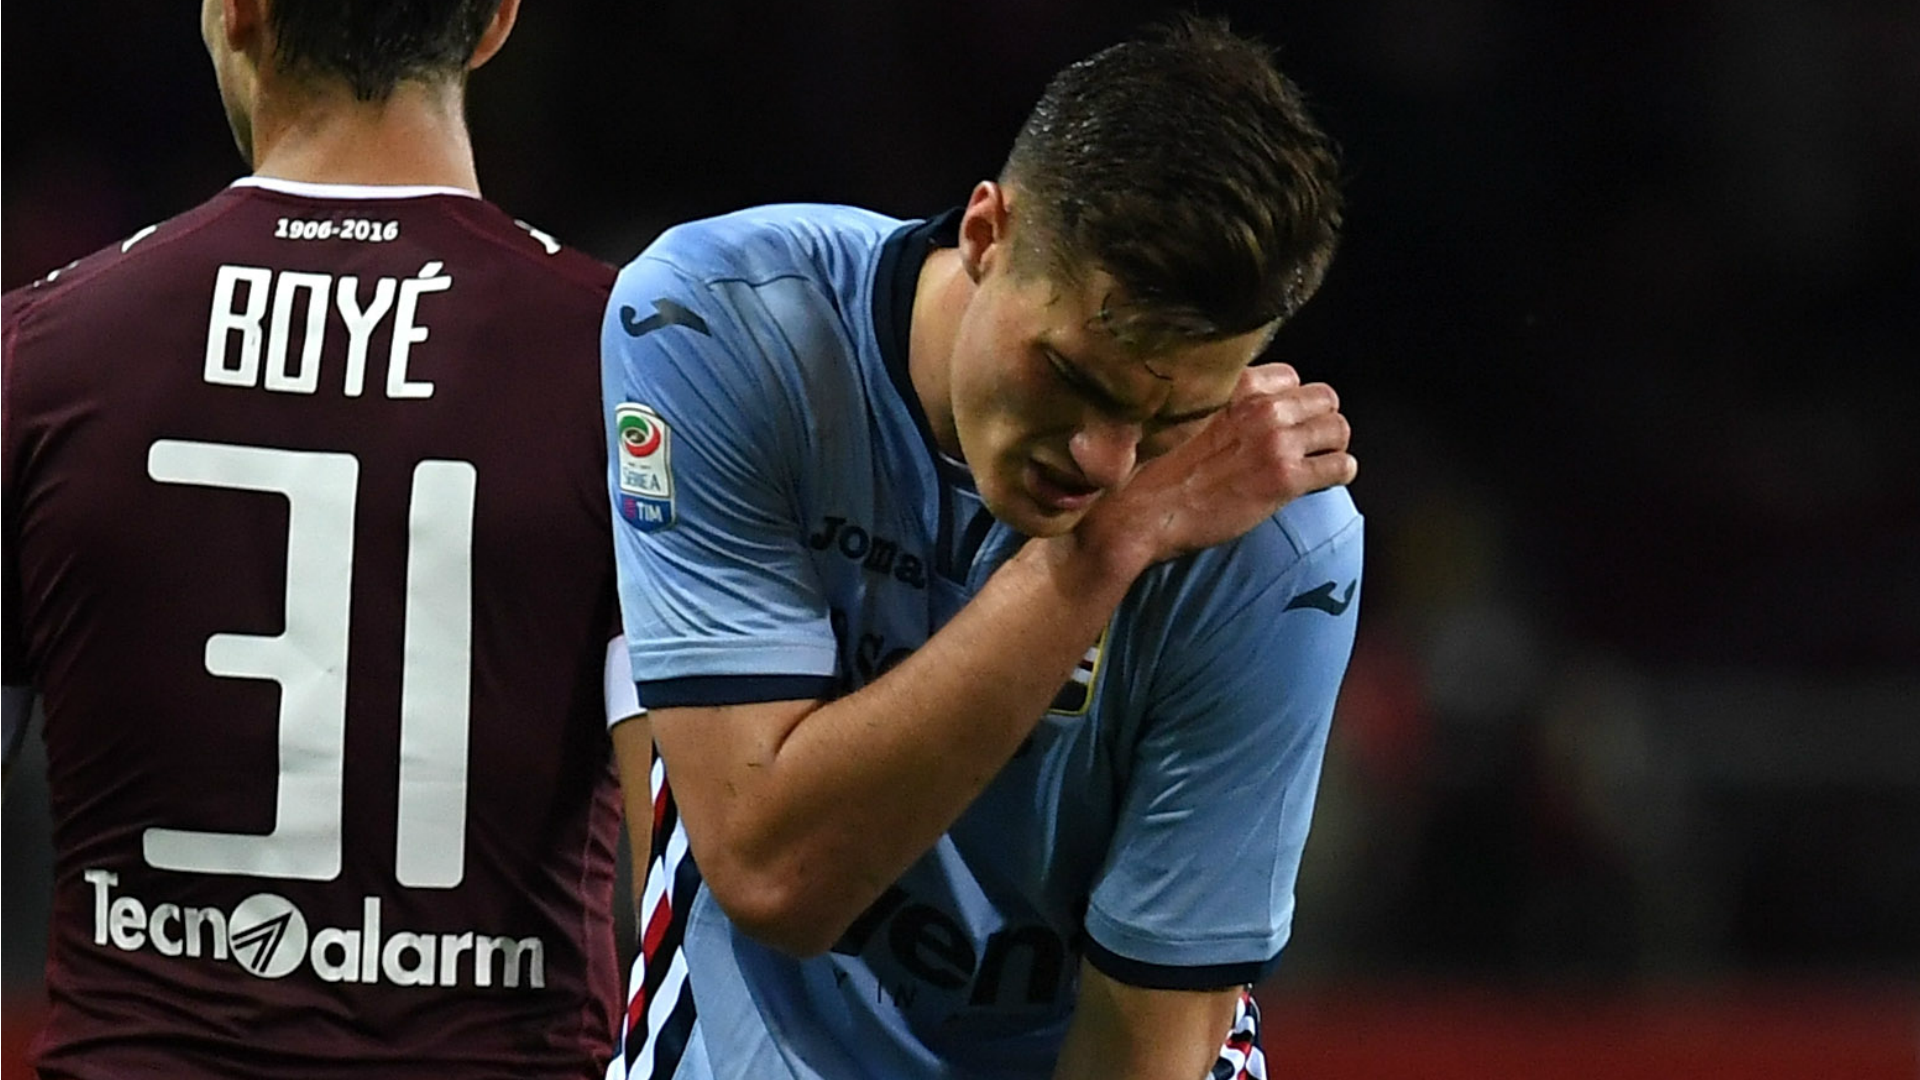 Juventus, Schick, manca la firma perché servono altri test fisici